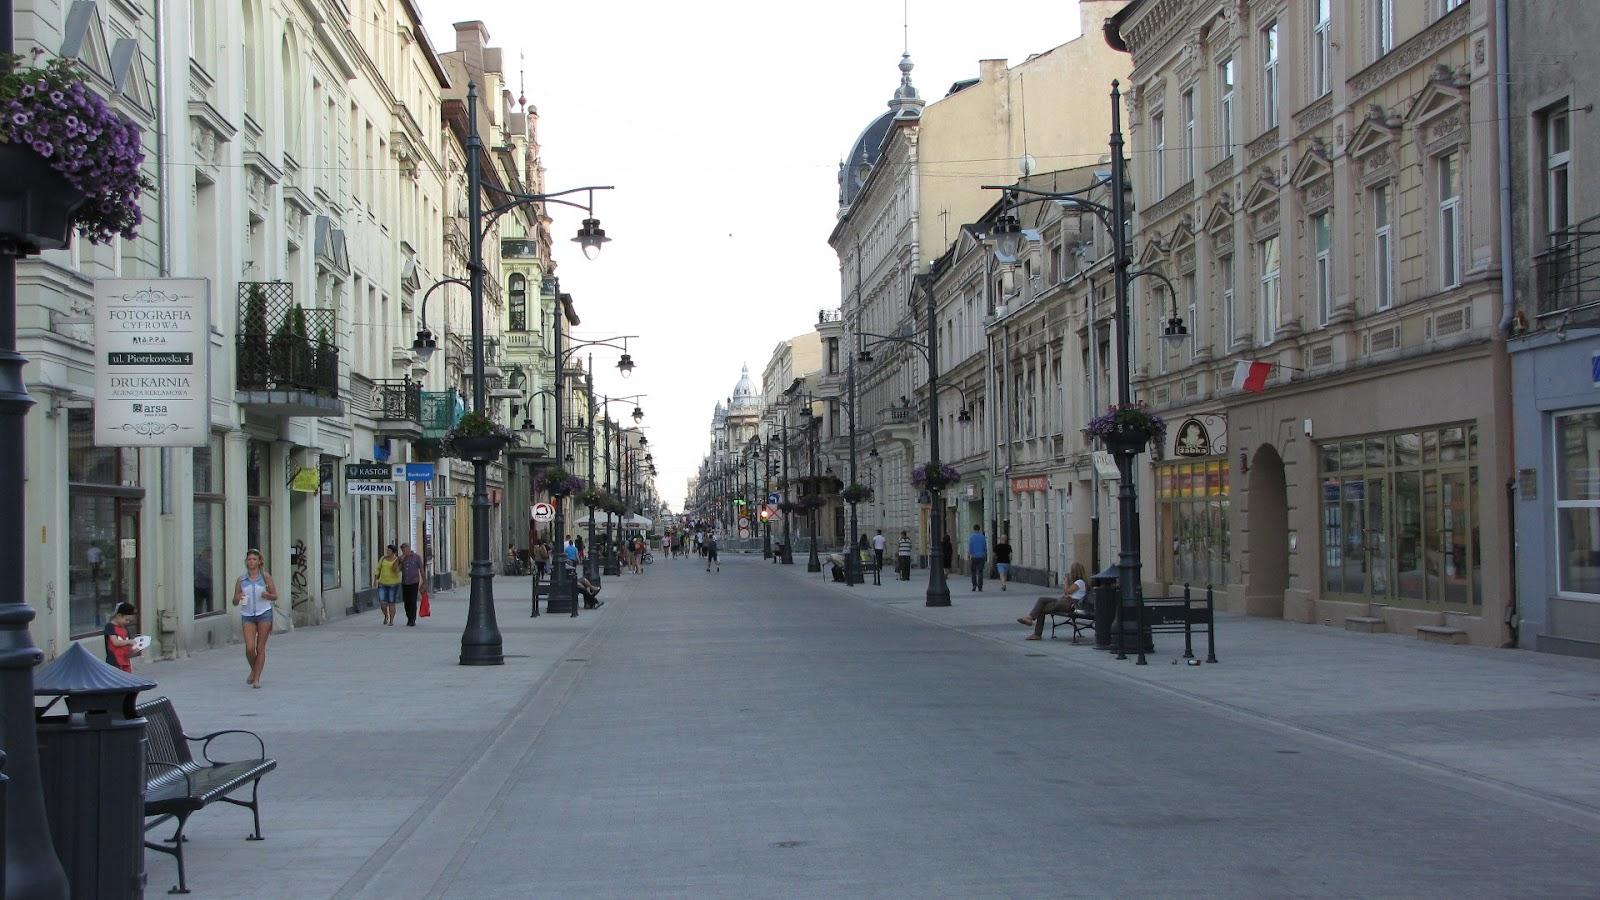 lodz piotrkowska walking street in the summer shops city center poland